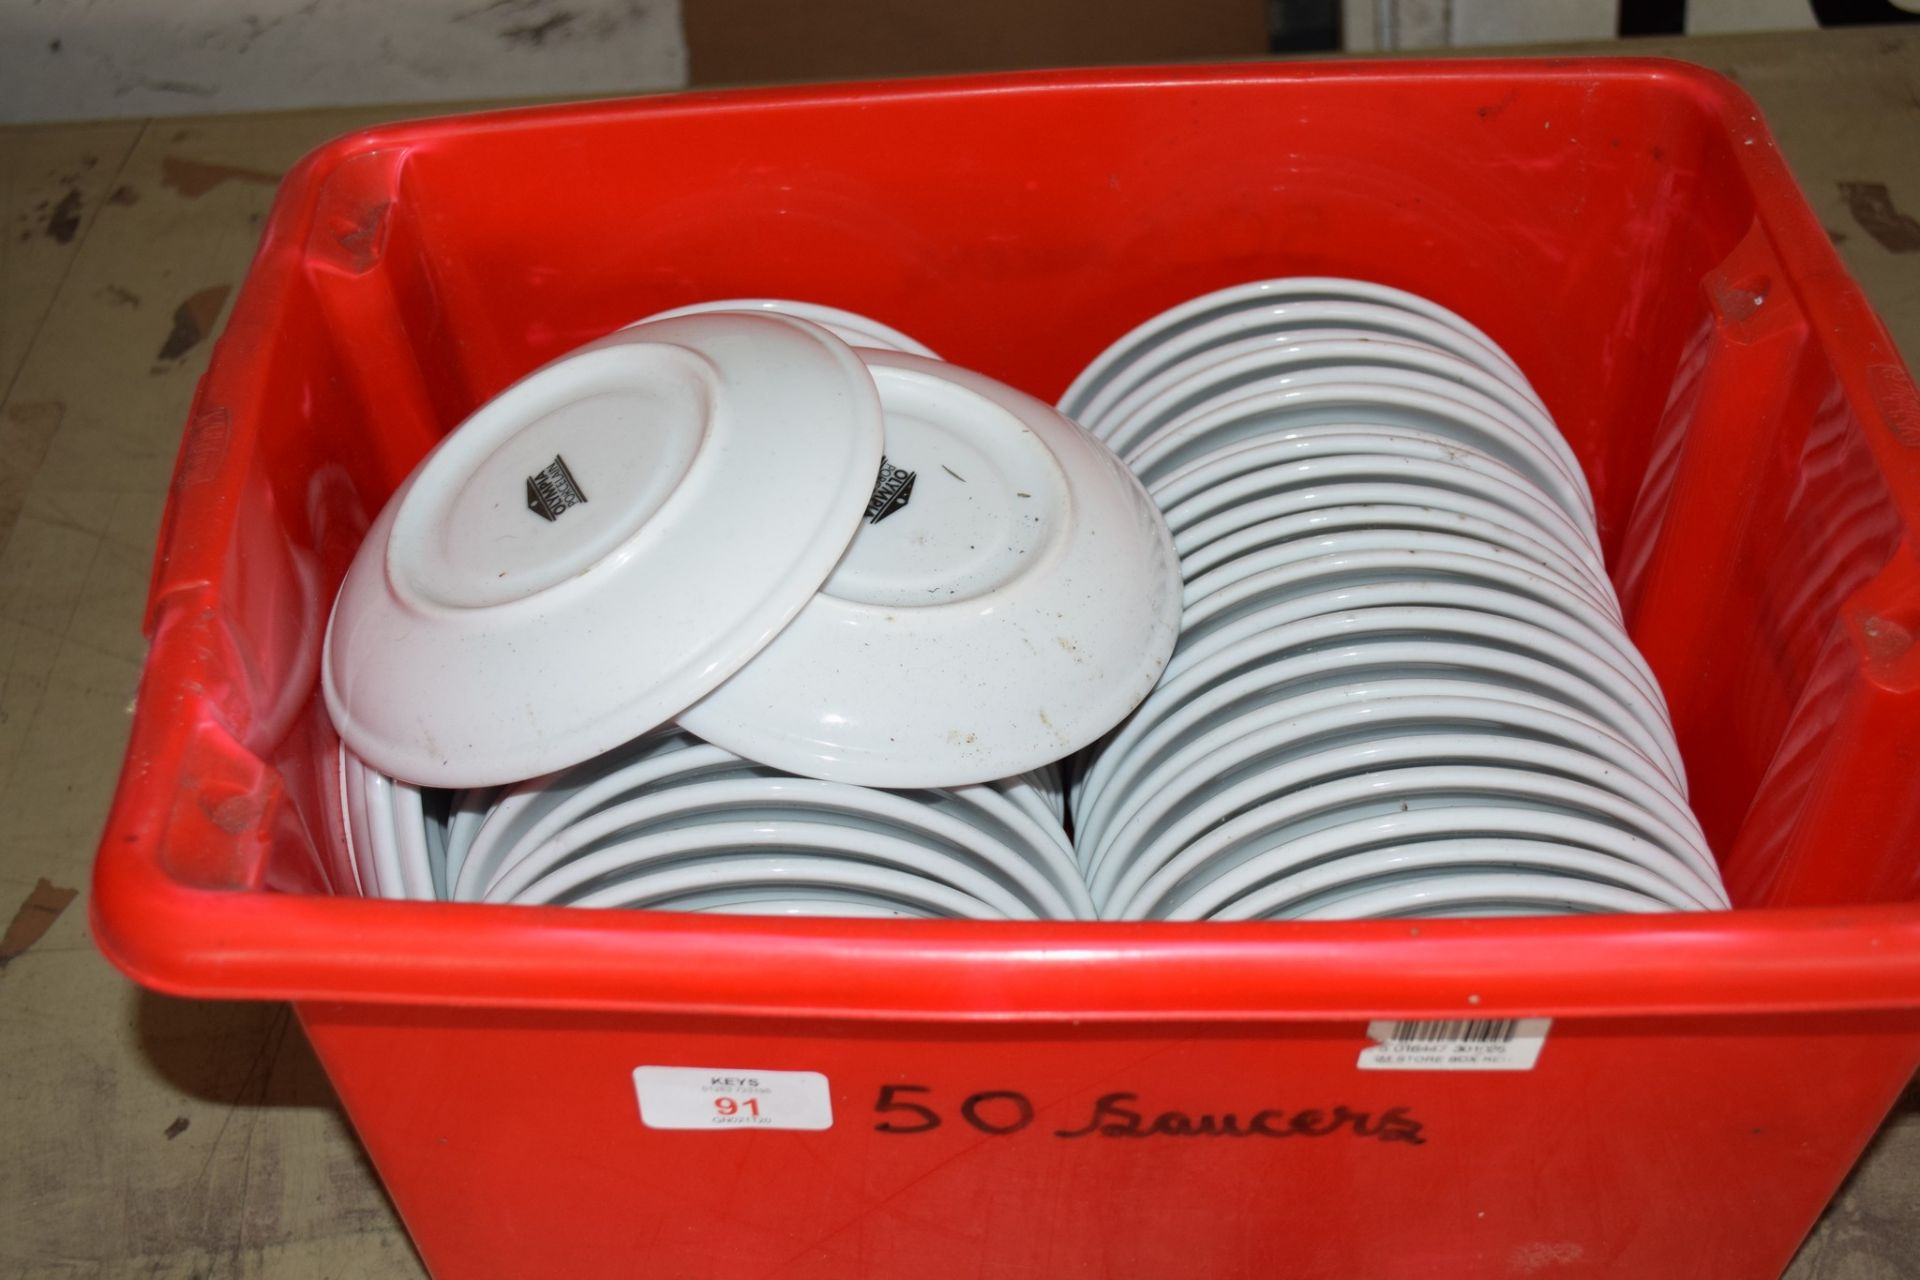 Crate: 50 Saucers.